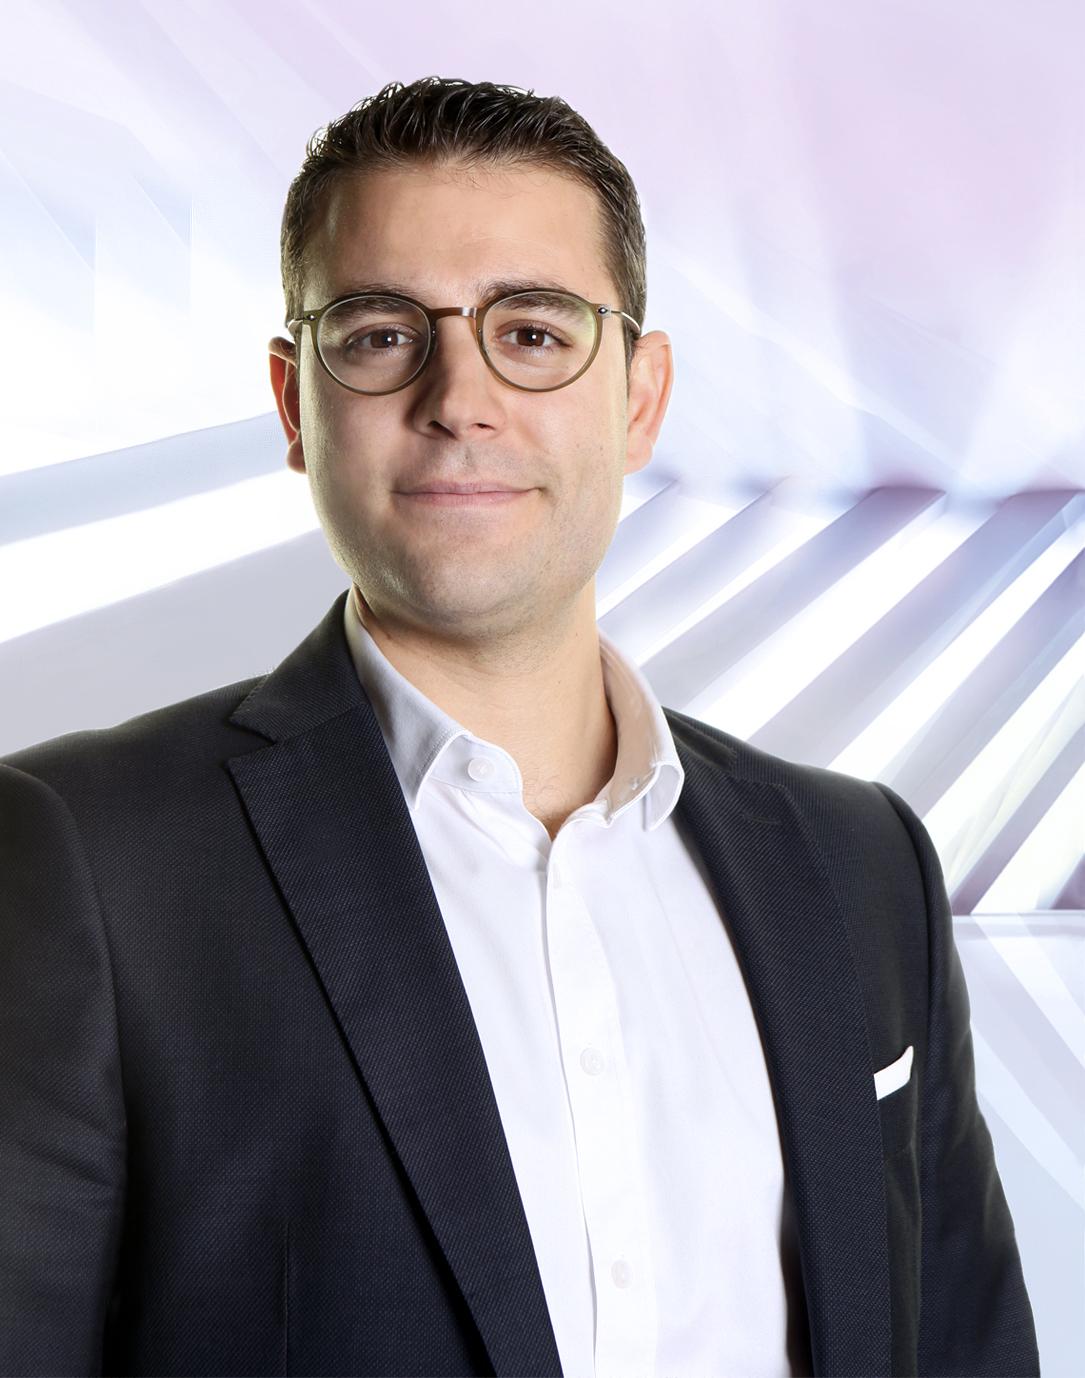 M. Sergio Isidoro